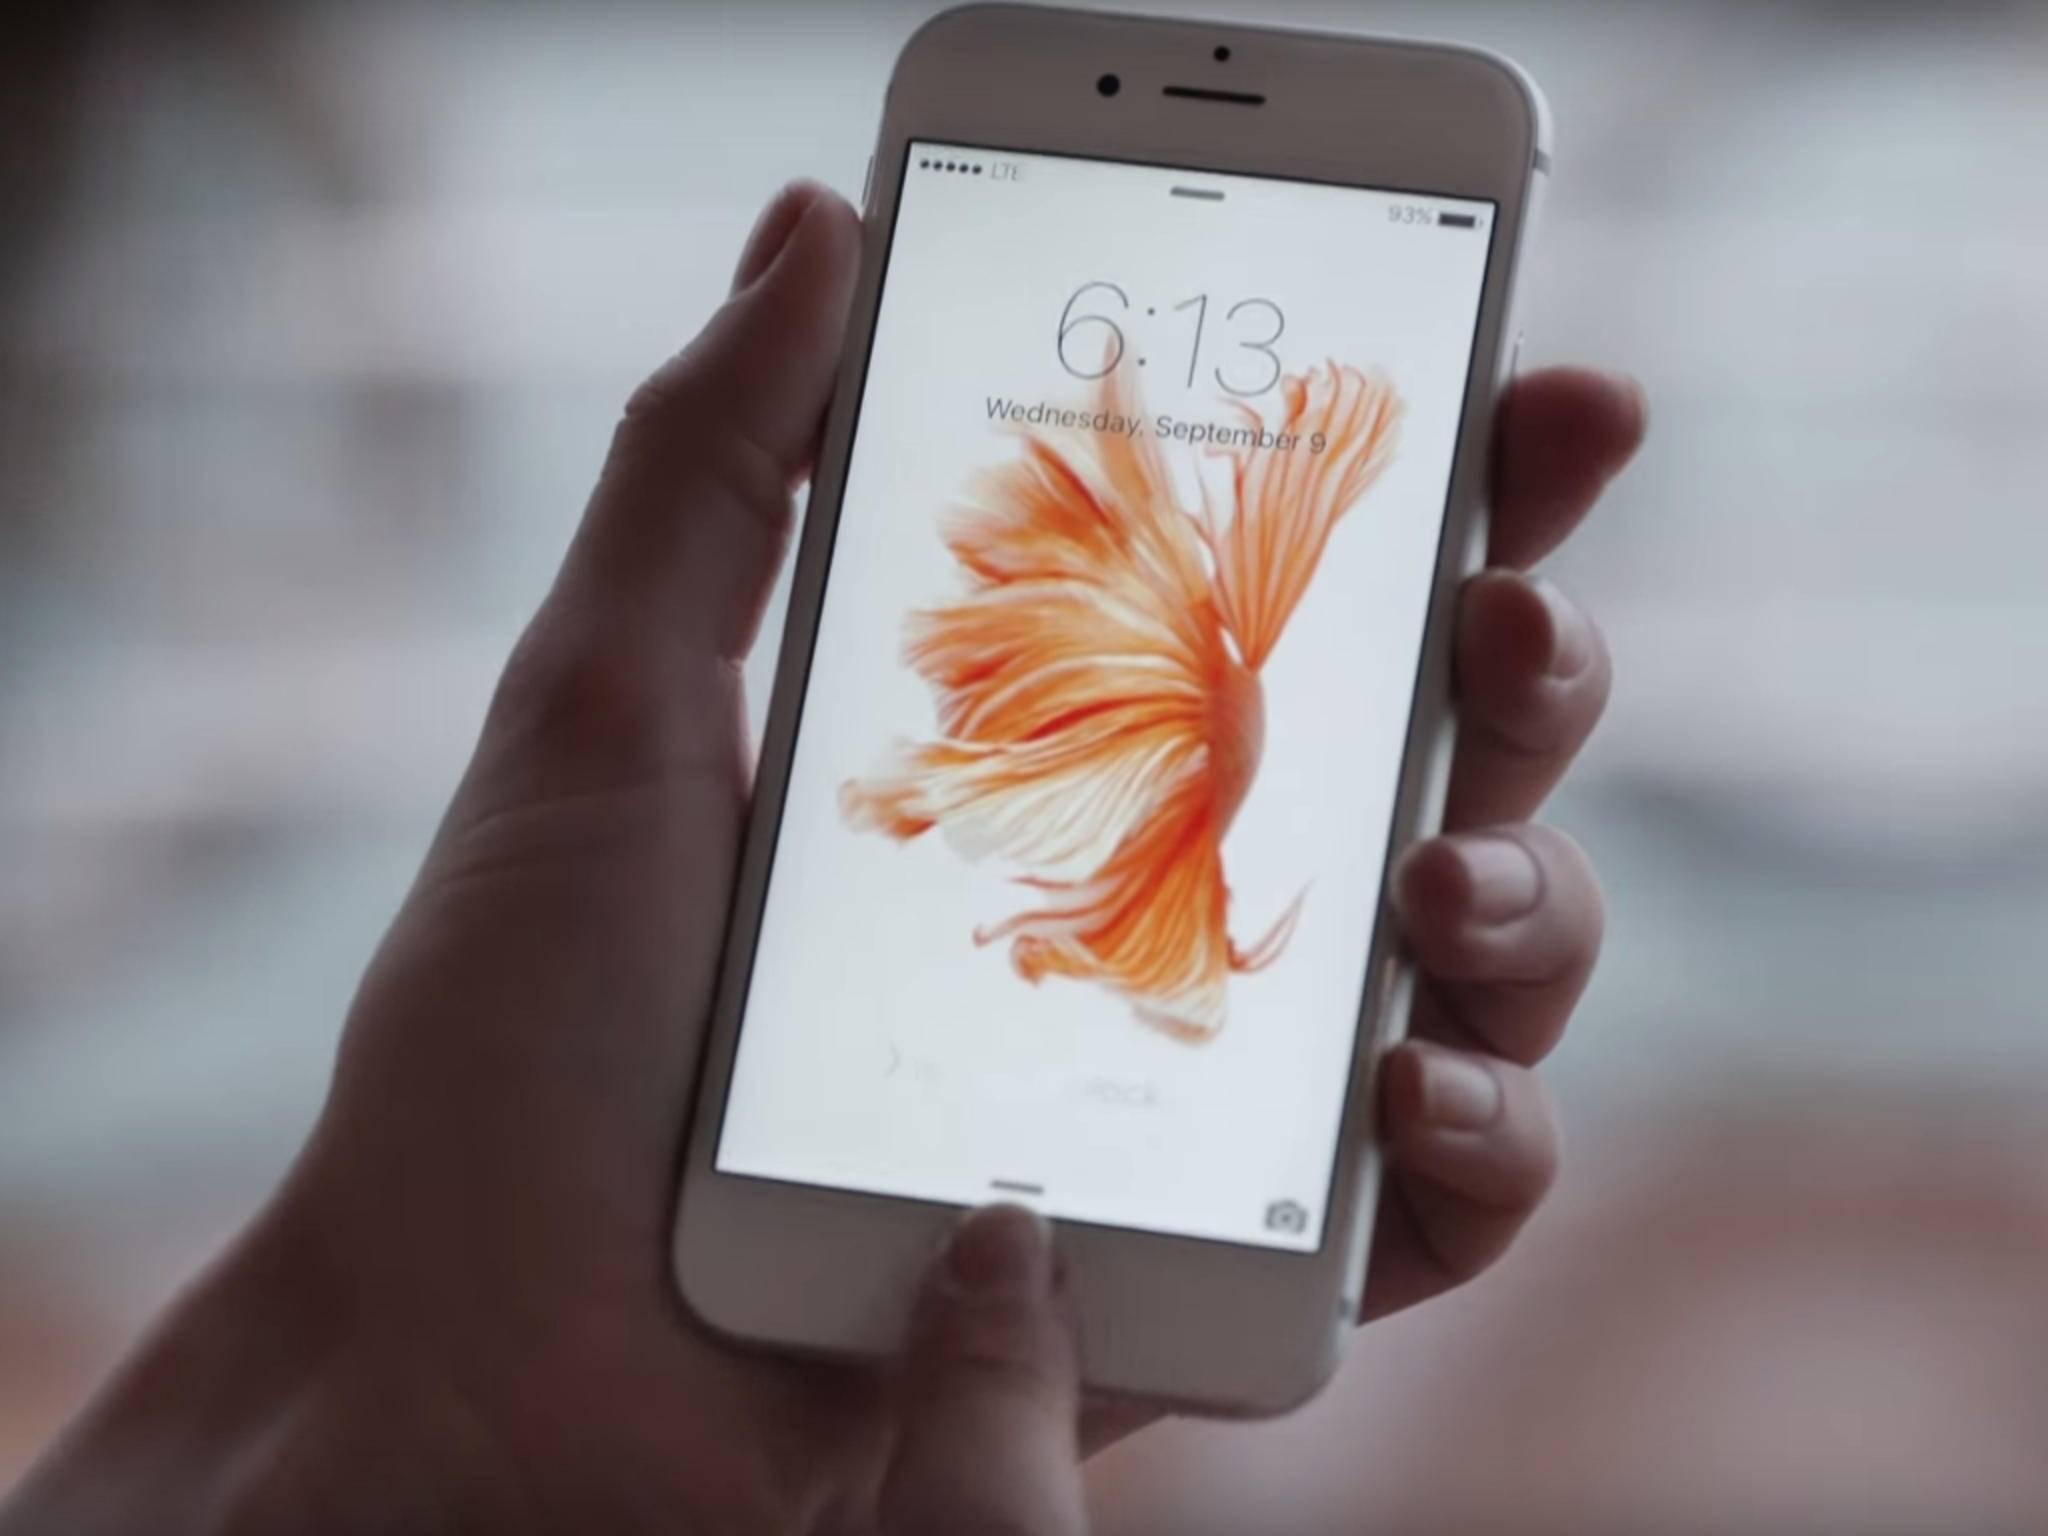 iPhone-Home-Button kaputt? Diese Alternative hilft